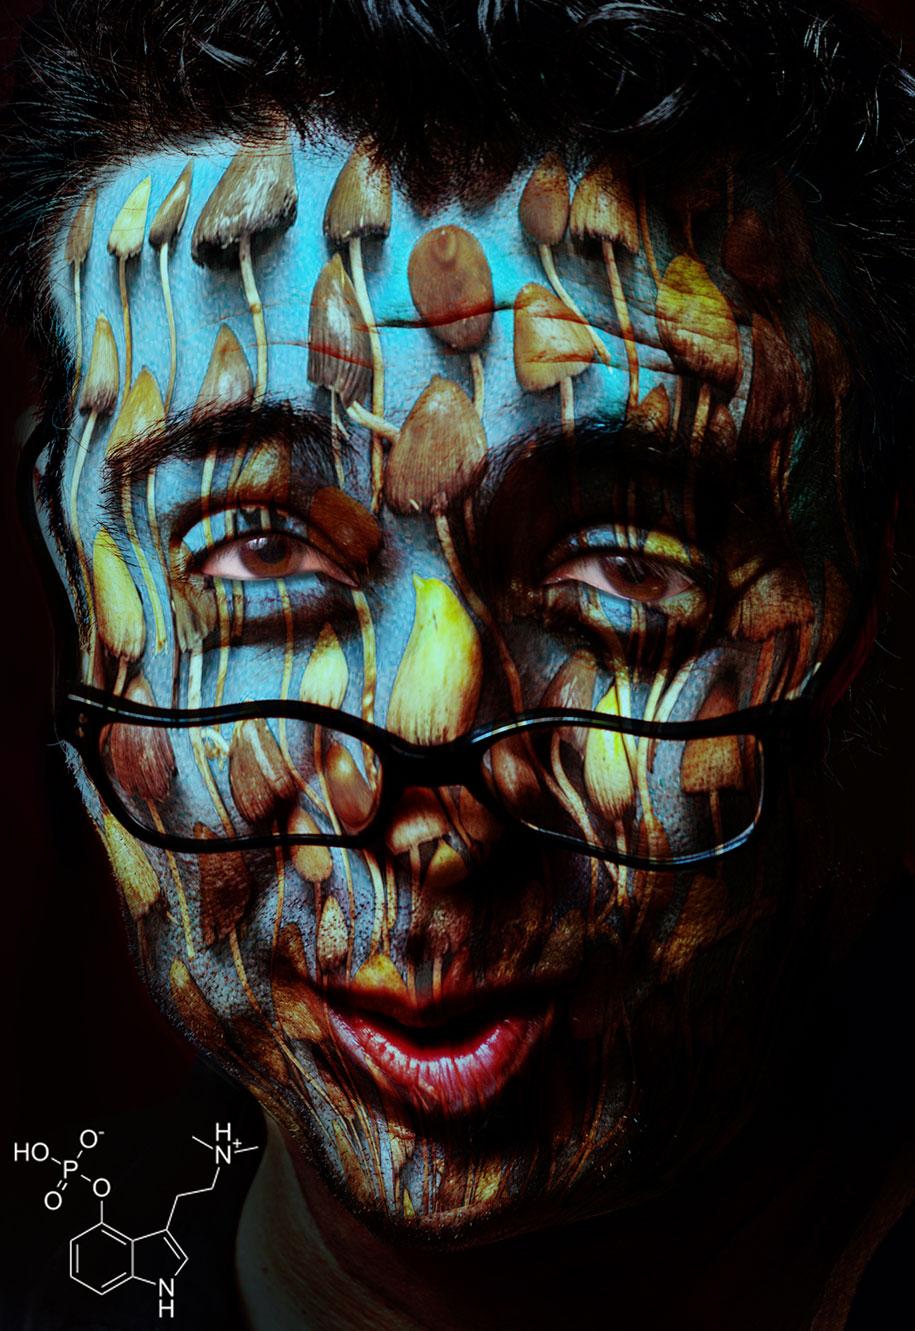 people-using-drugs-portraits-inebrination-les-baker-v-7